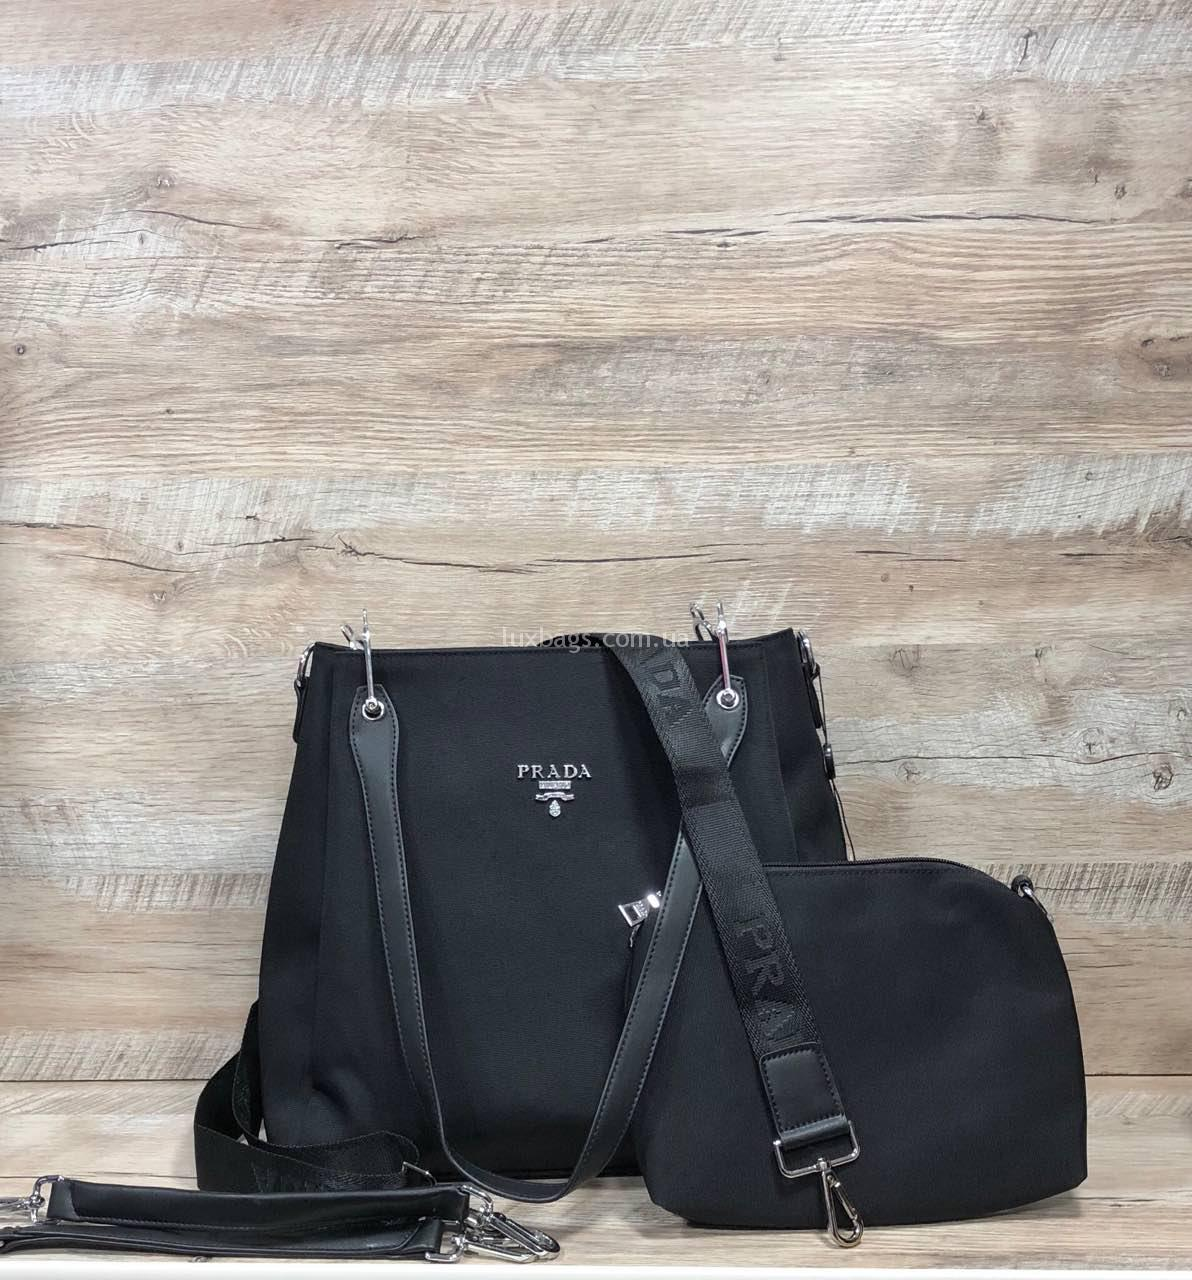 Купить Женская сумка из плащевка Prada Прада   lux-bags 1e8fd7ebaee